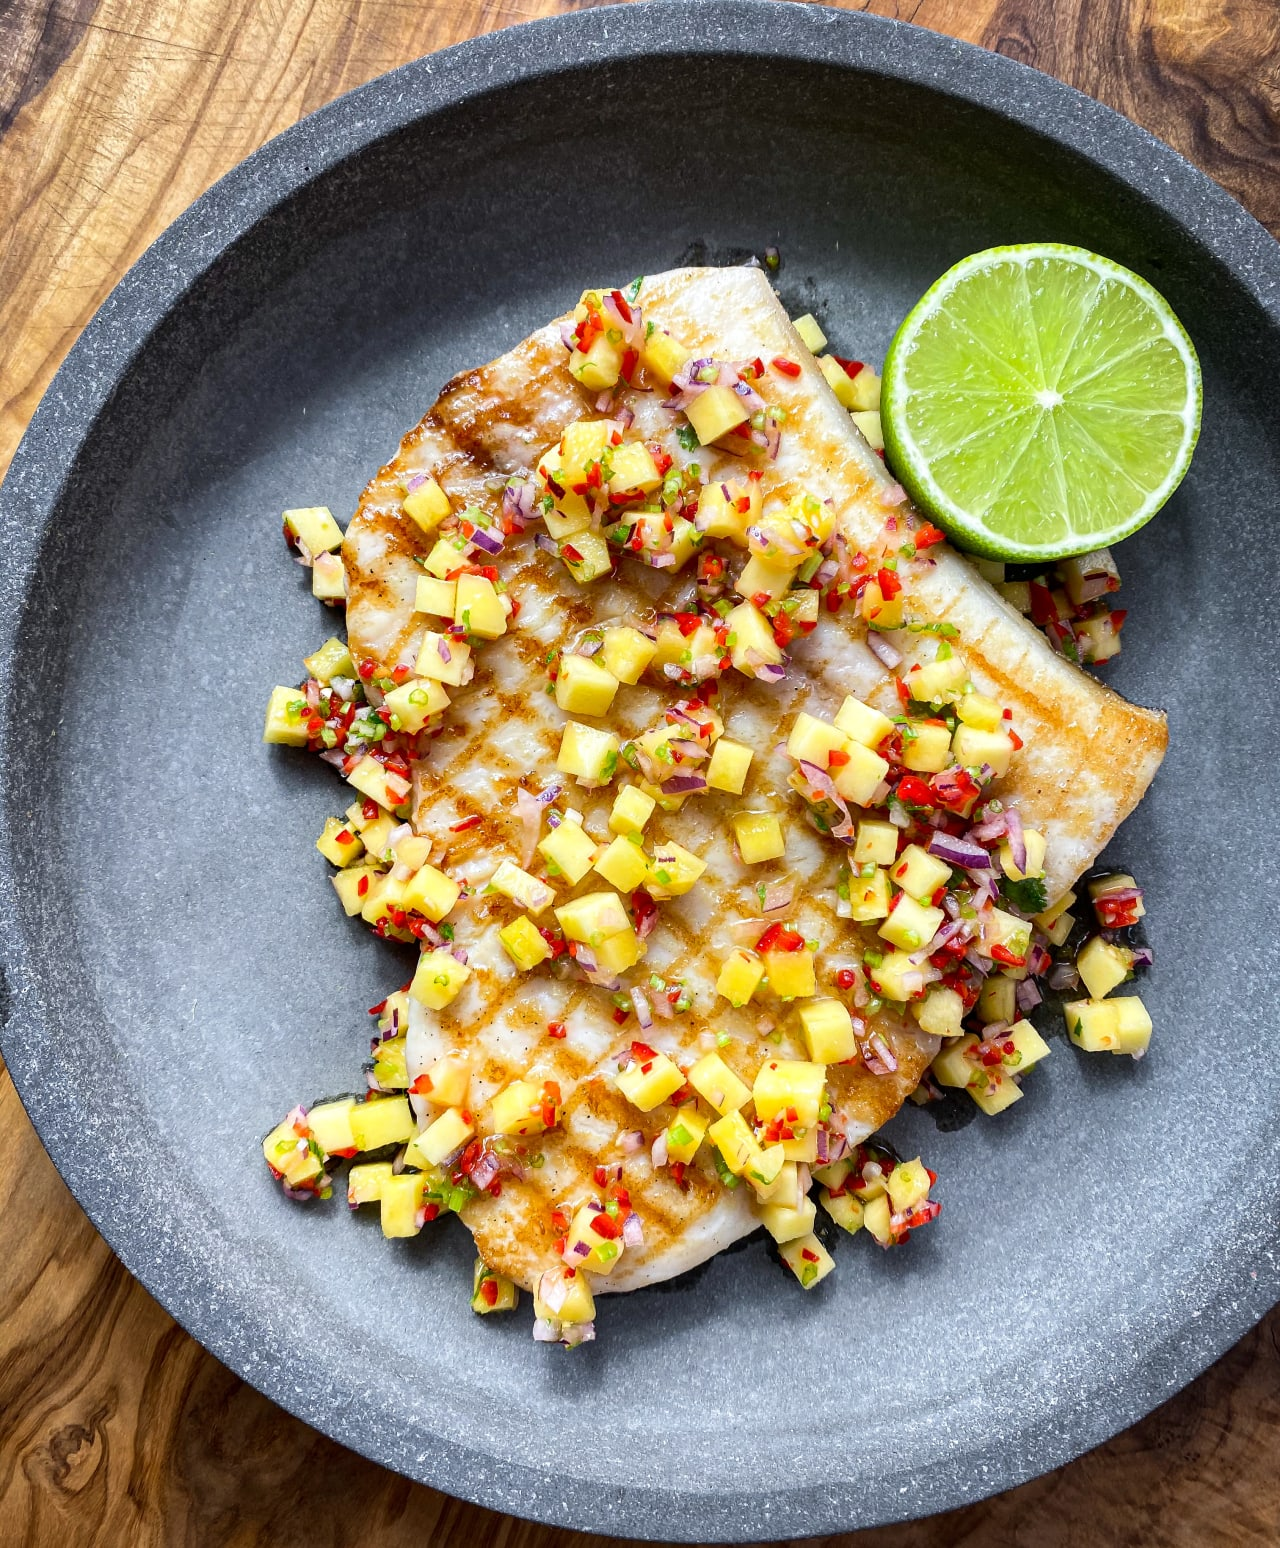 Griddled Swordfish with Mango Salsa